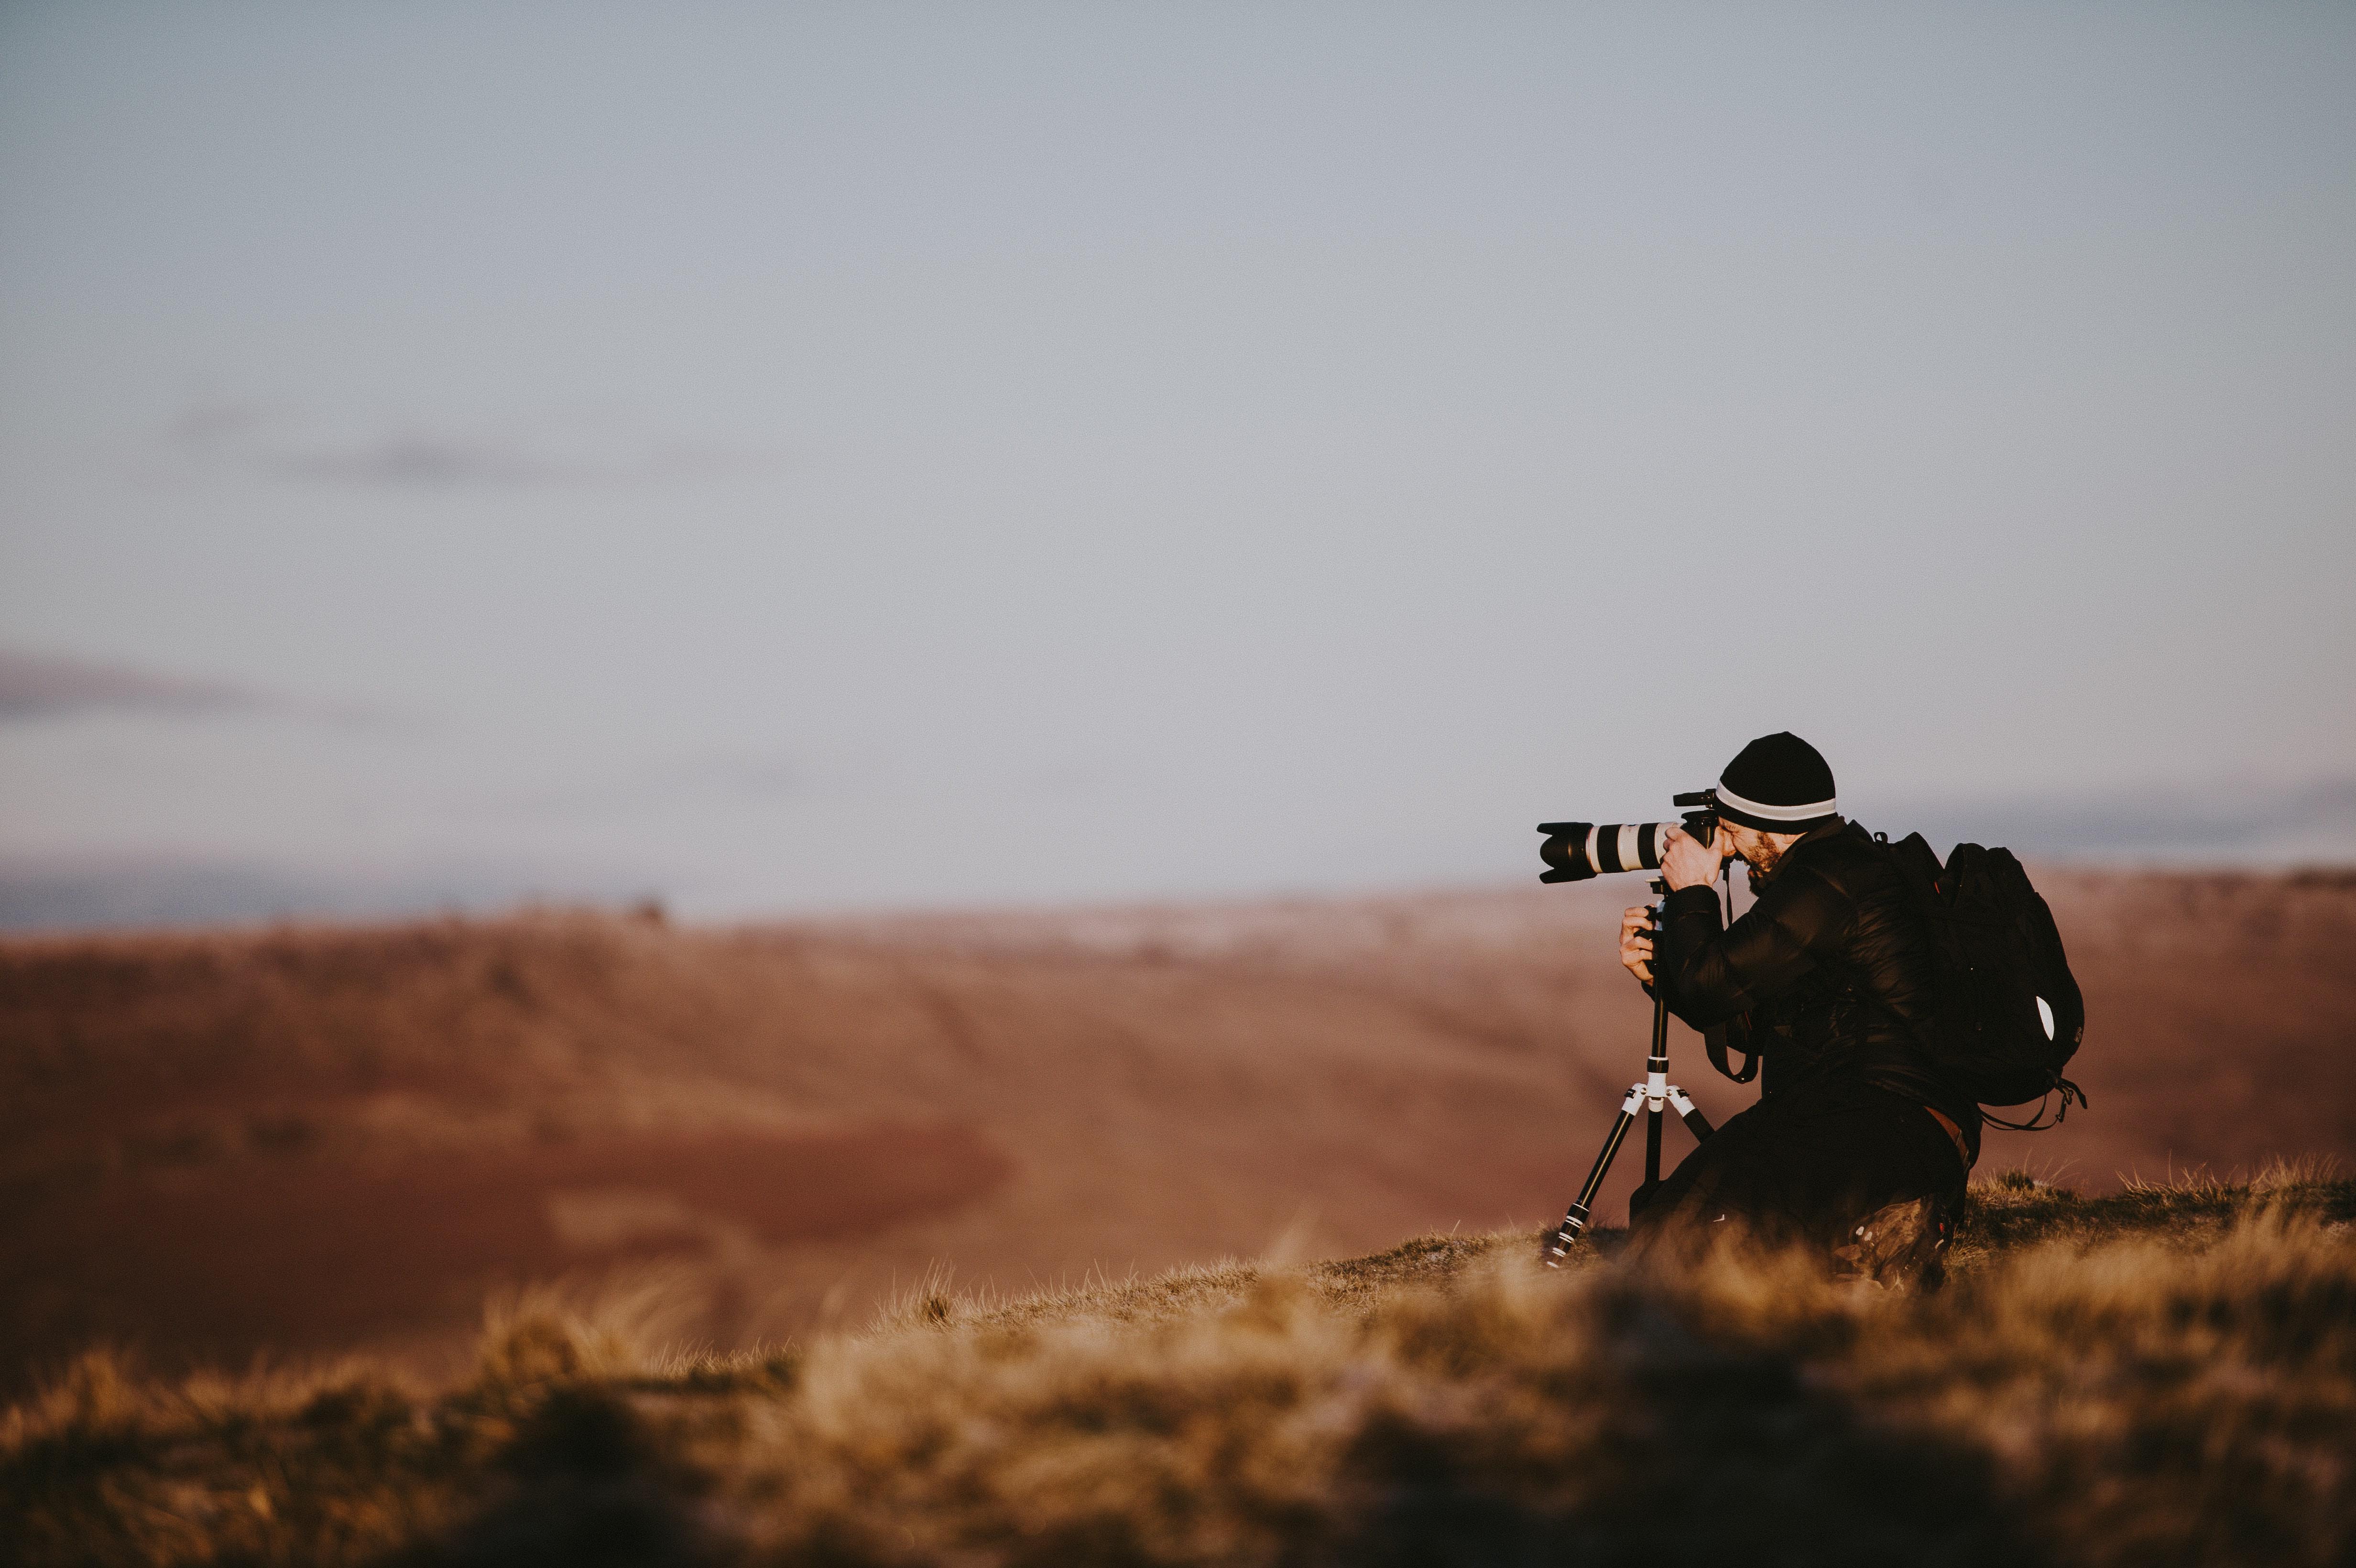 NGO photographer in africa